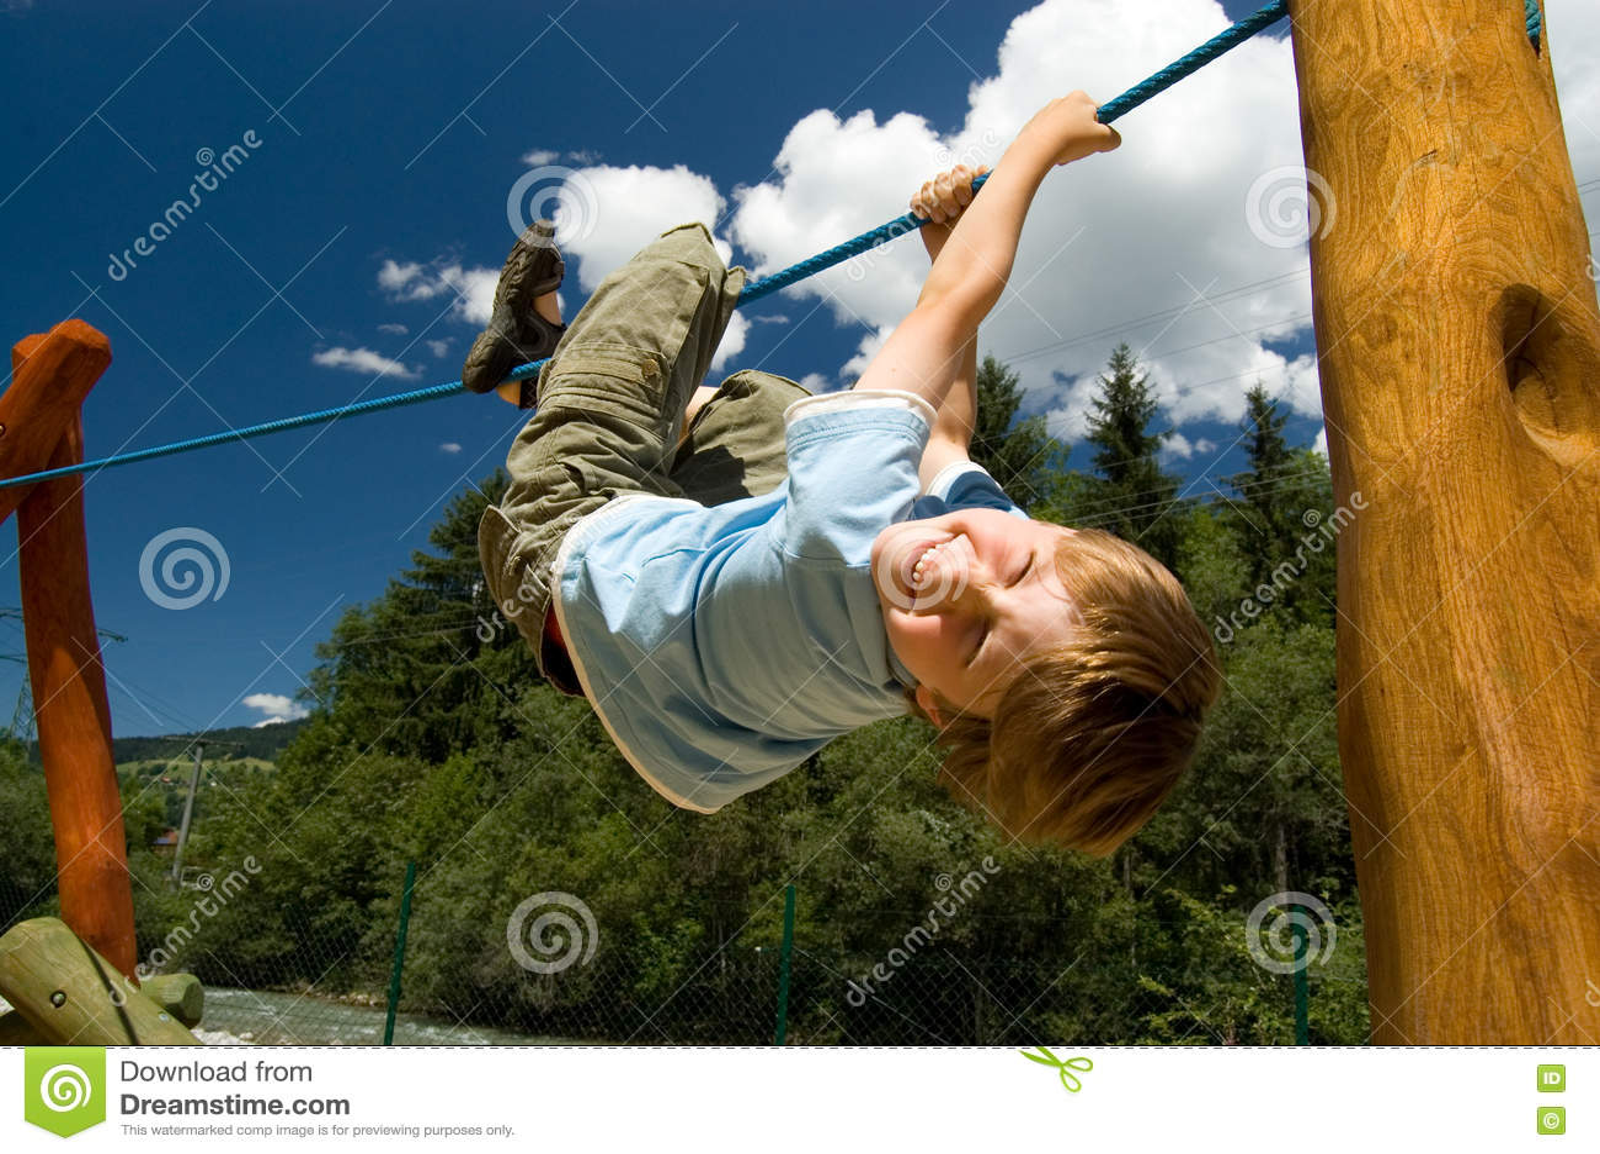 Boy on a climbing rope